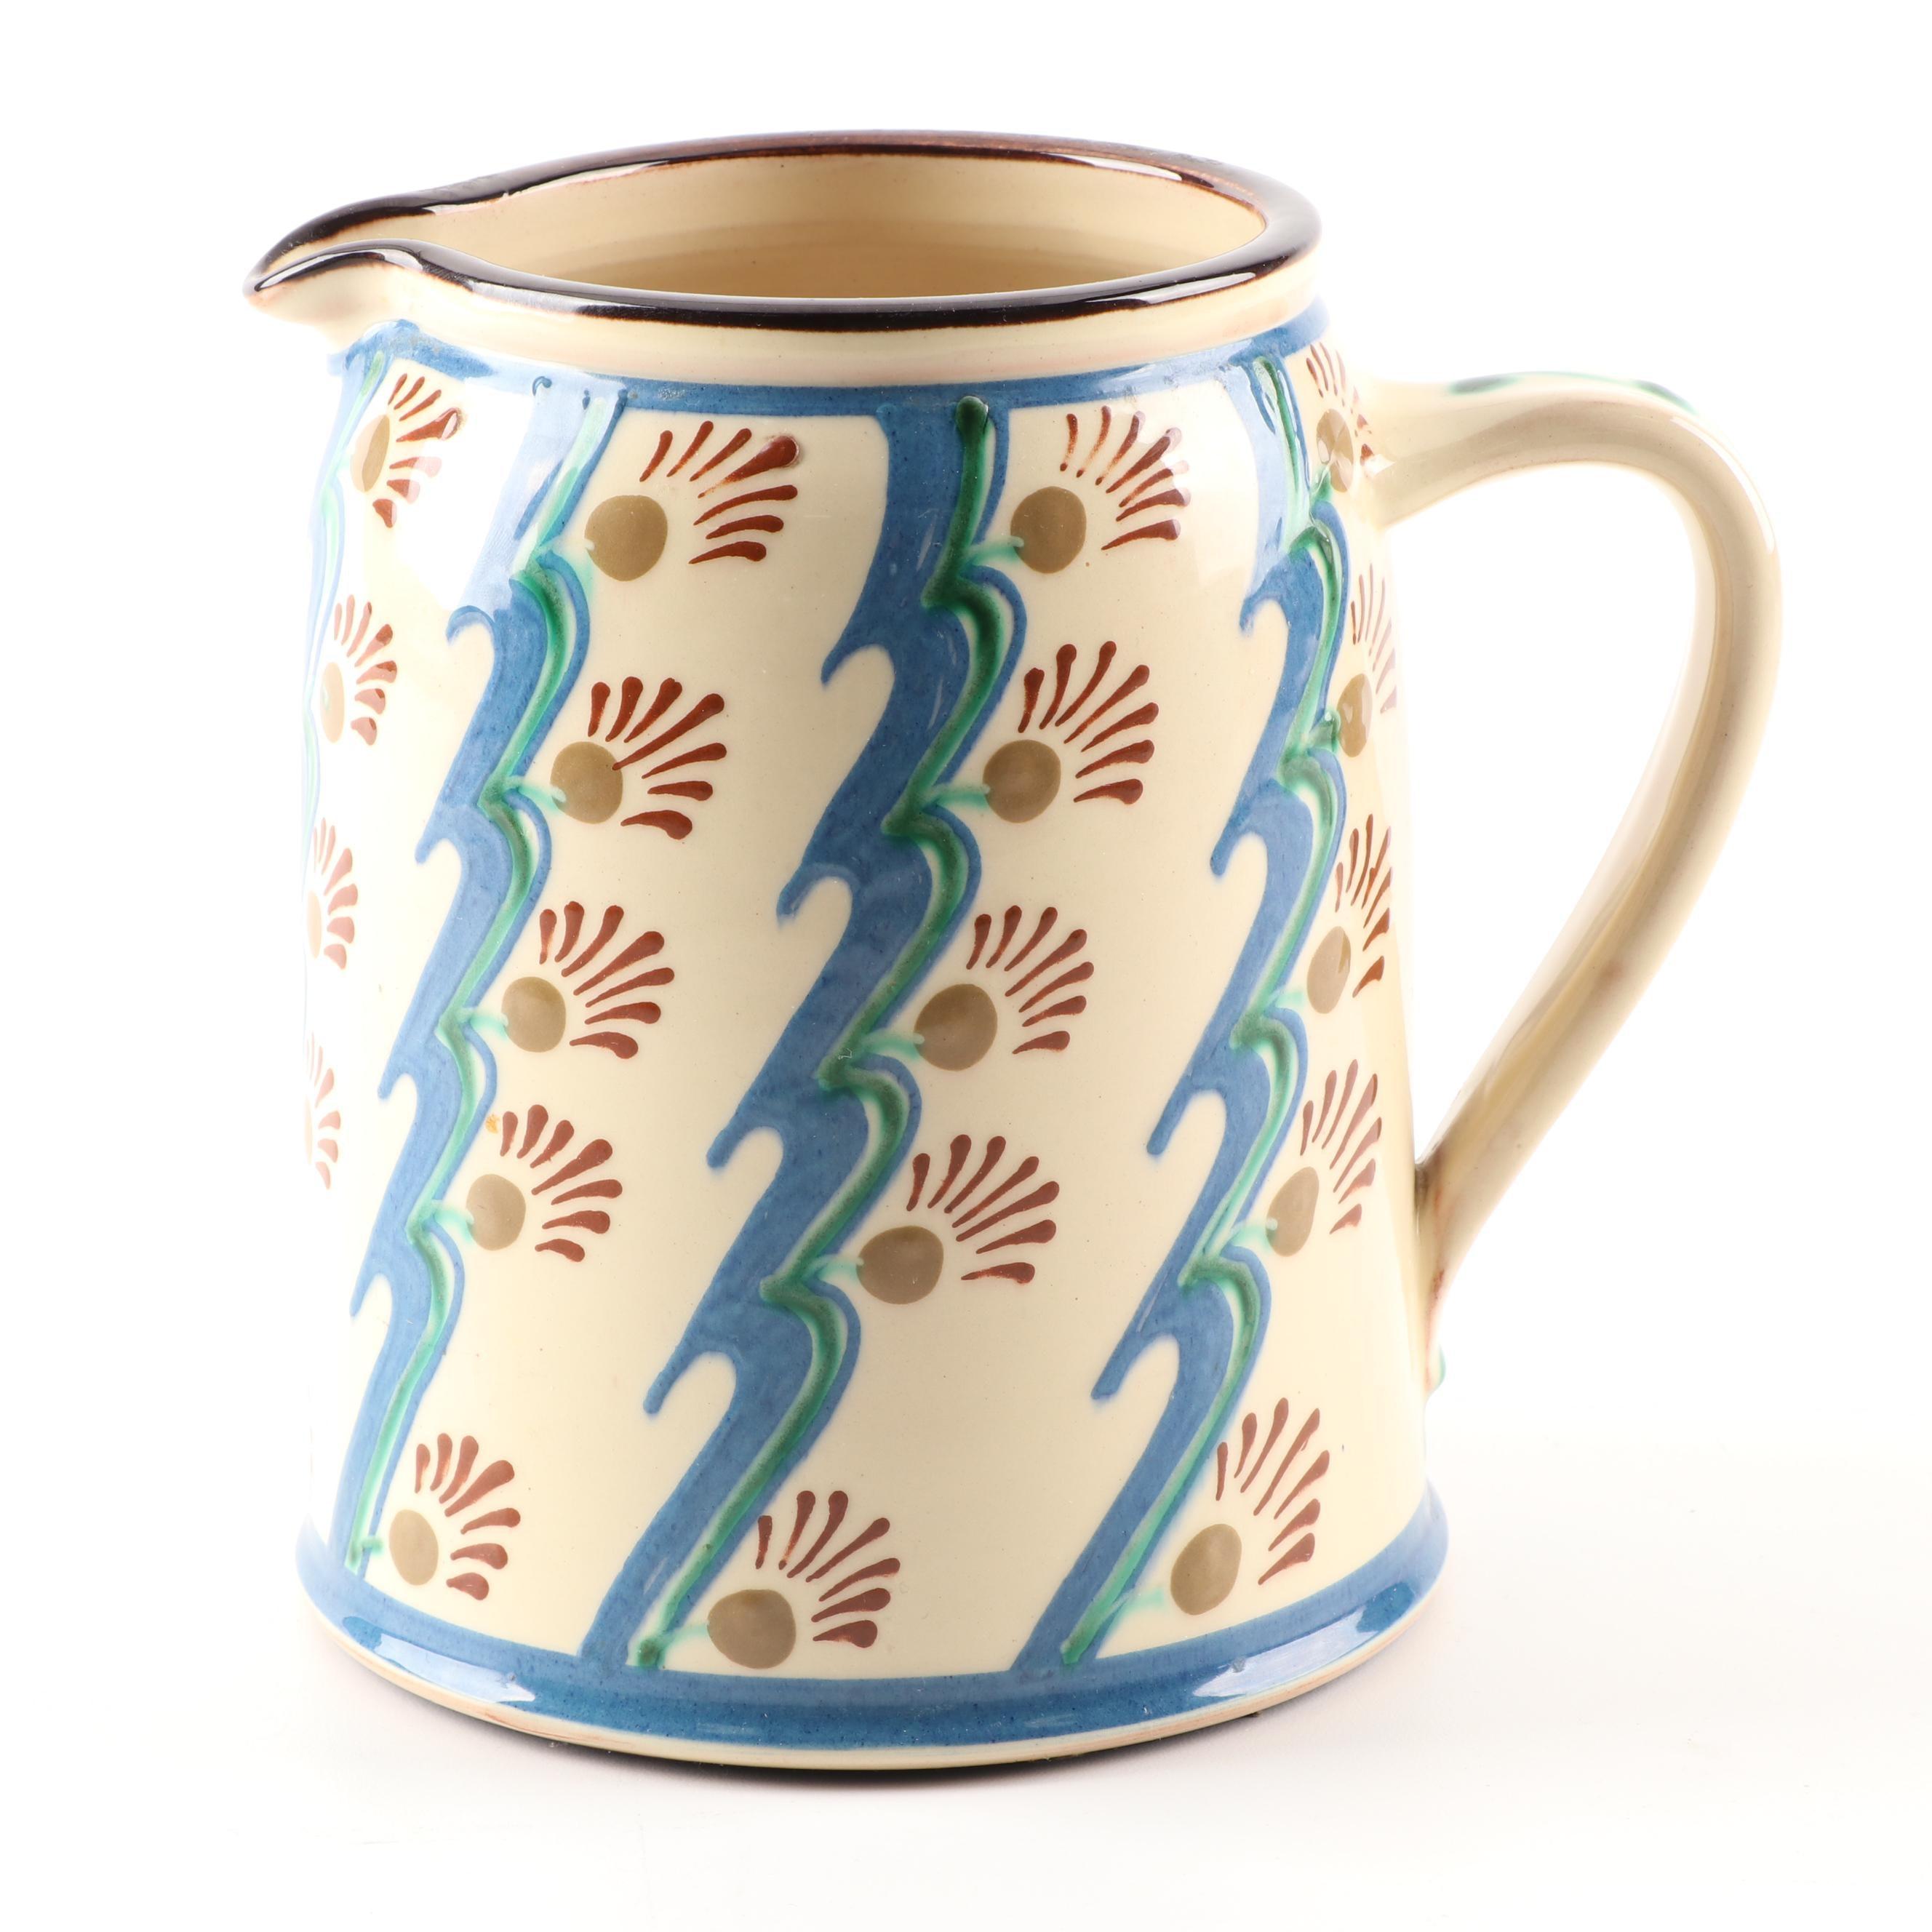 Decorative Ceramic Pitcher